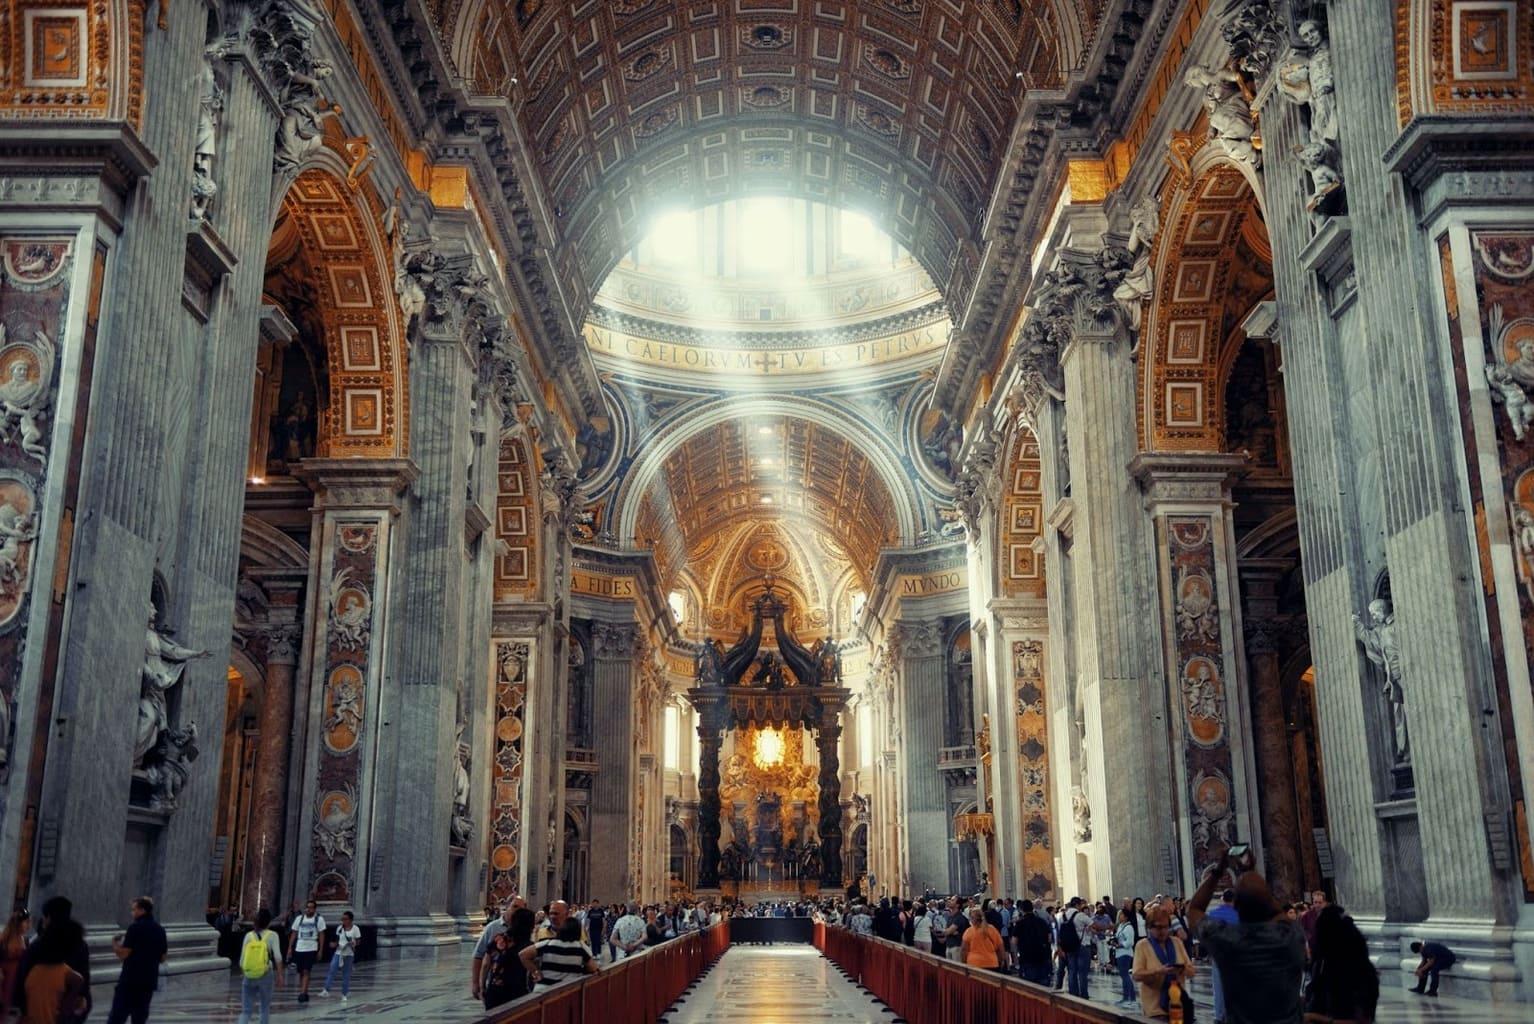 St Peter's basilica interior